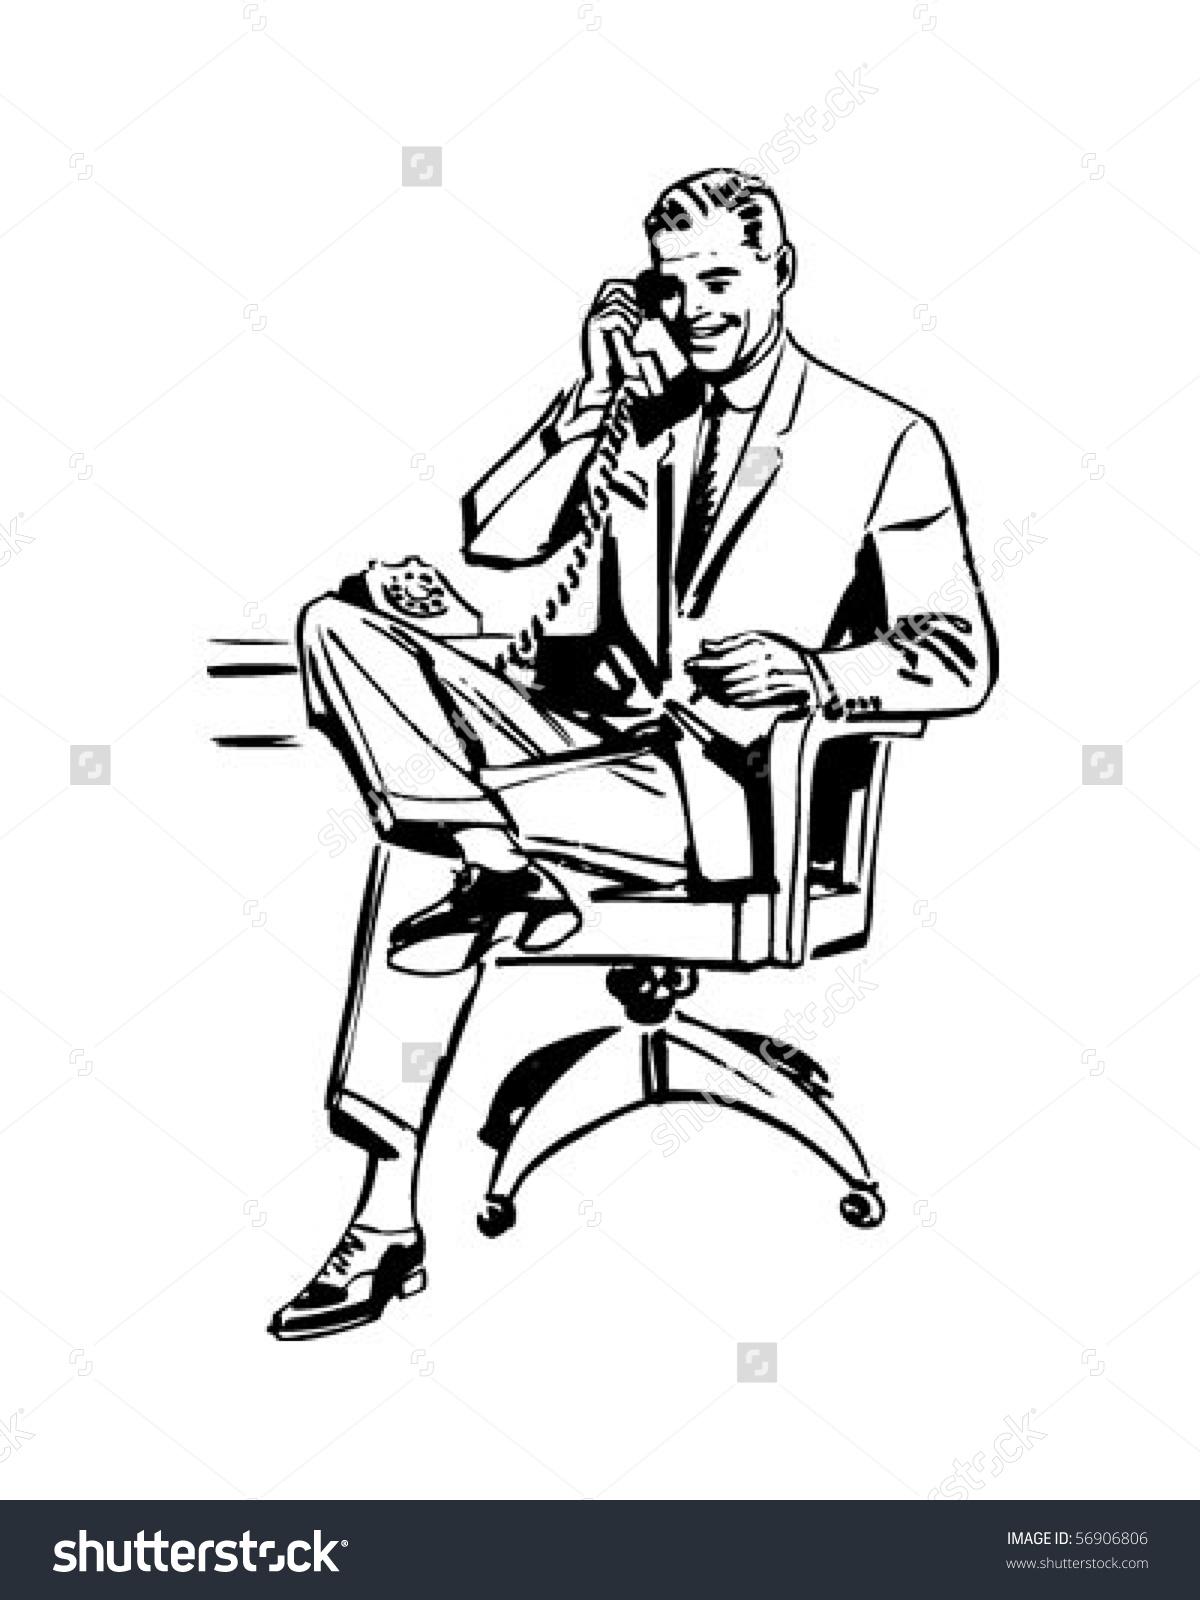 Man Office Chair Retro Clip Art Stock Vector 56906806.